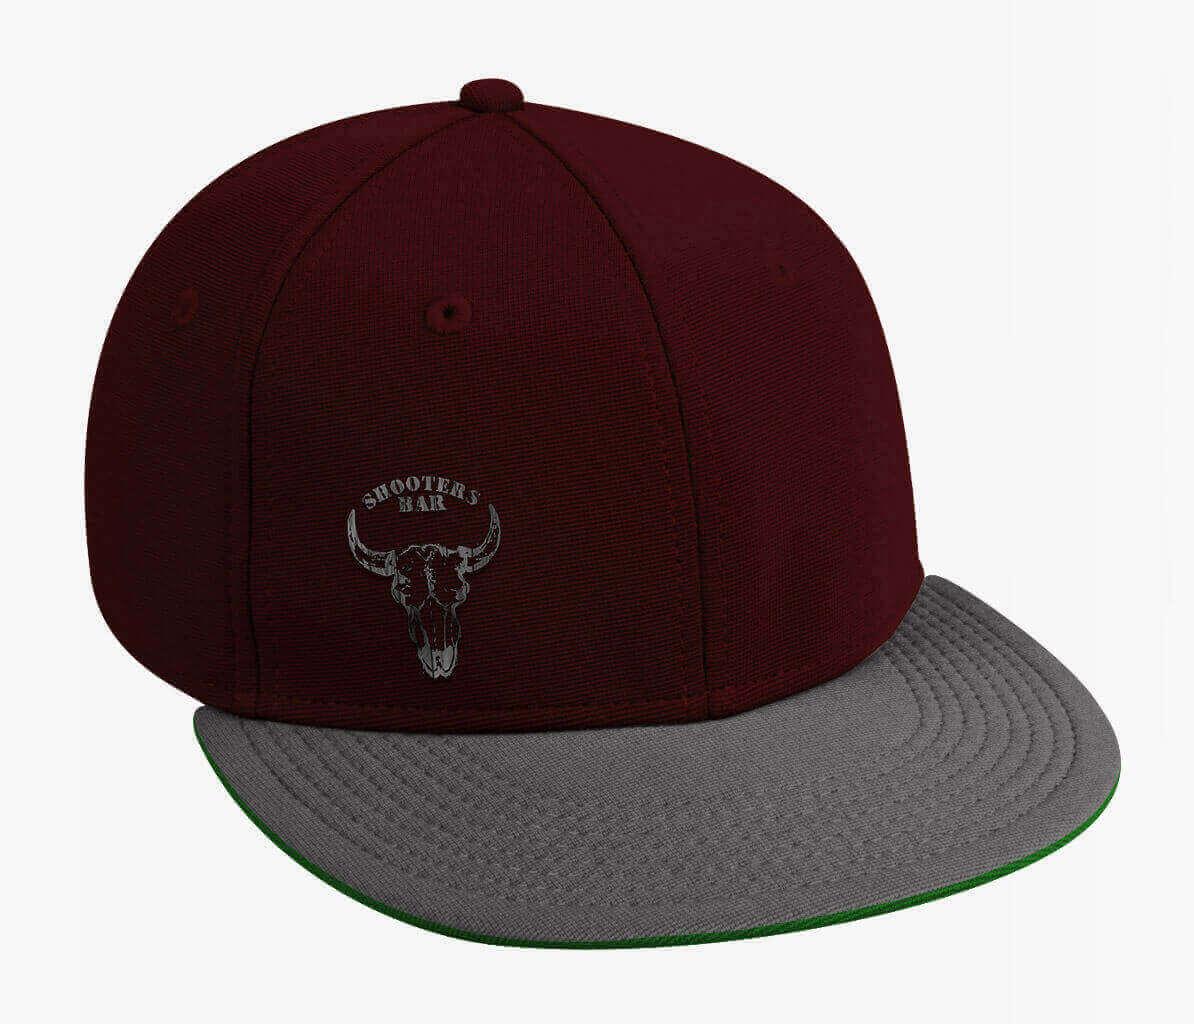 Shooters bar Merchandise Snapback Cap